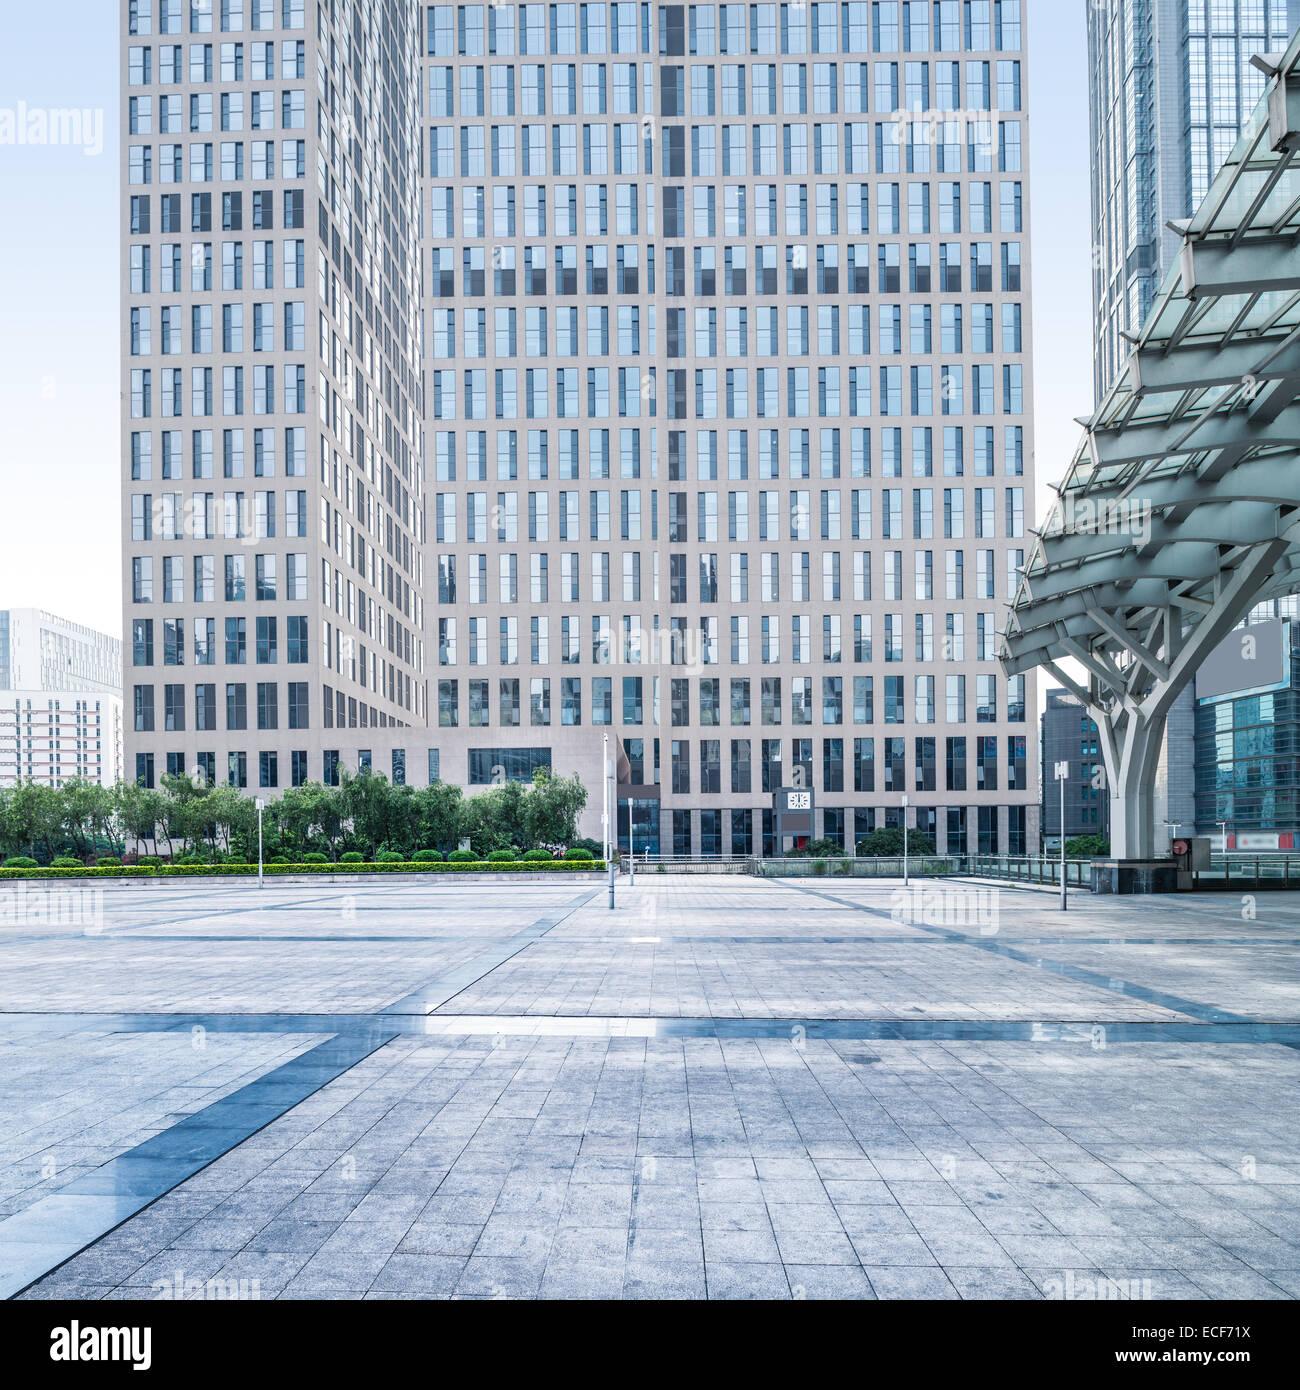 Download 84 Background Hd City Road HD Terbaru